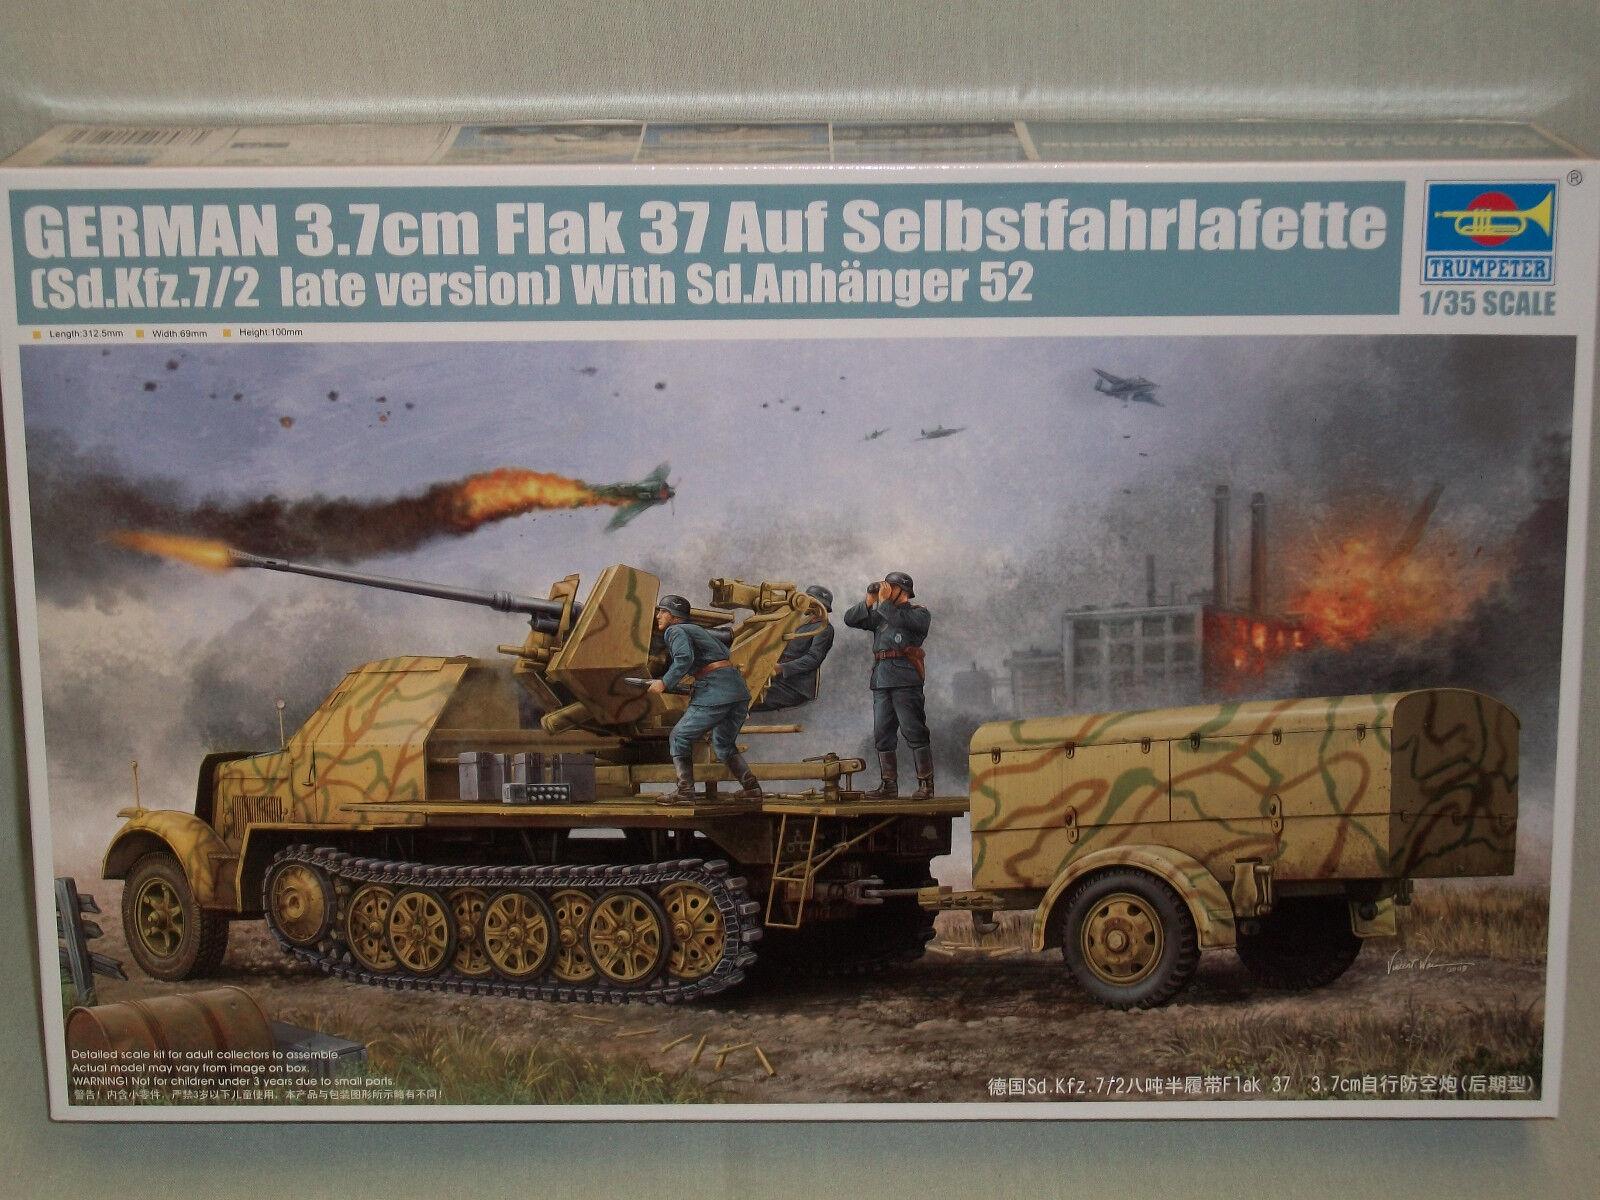 01526 Flak37 Sd.Kfz.7  2 SPAAG Armor fordon 1  35 skala modelllllerlerl trumpetare